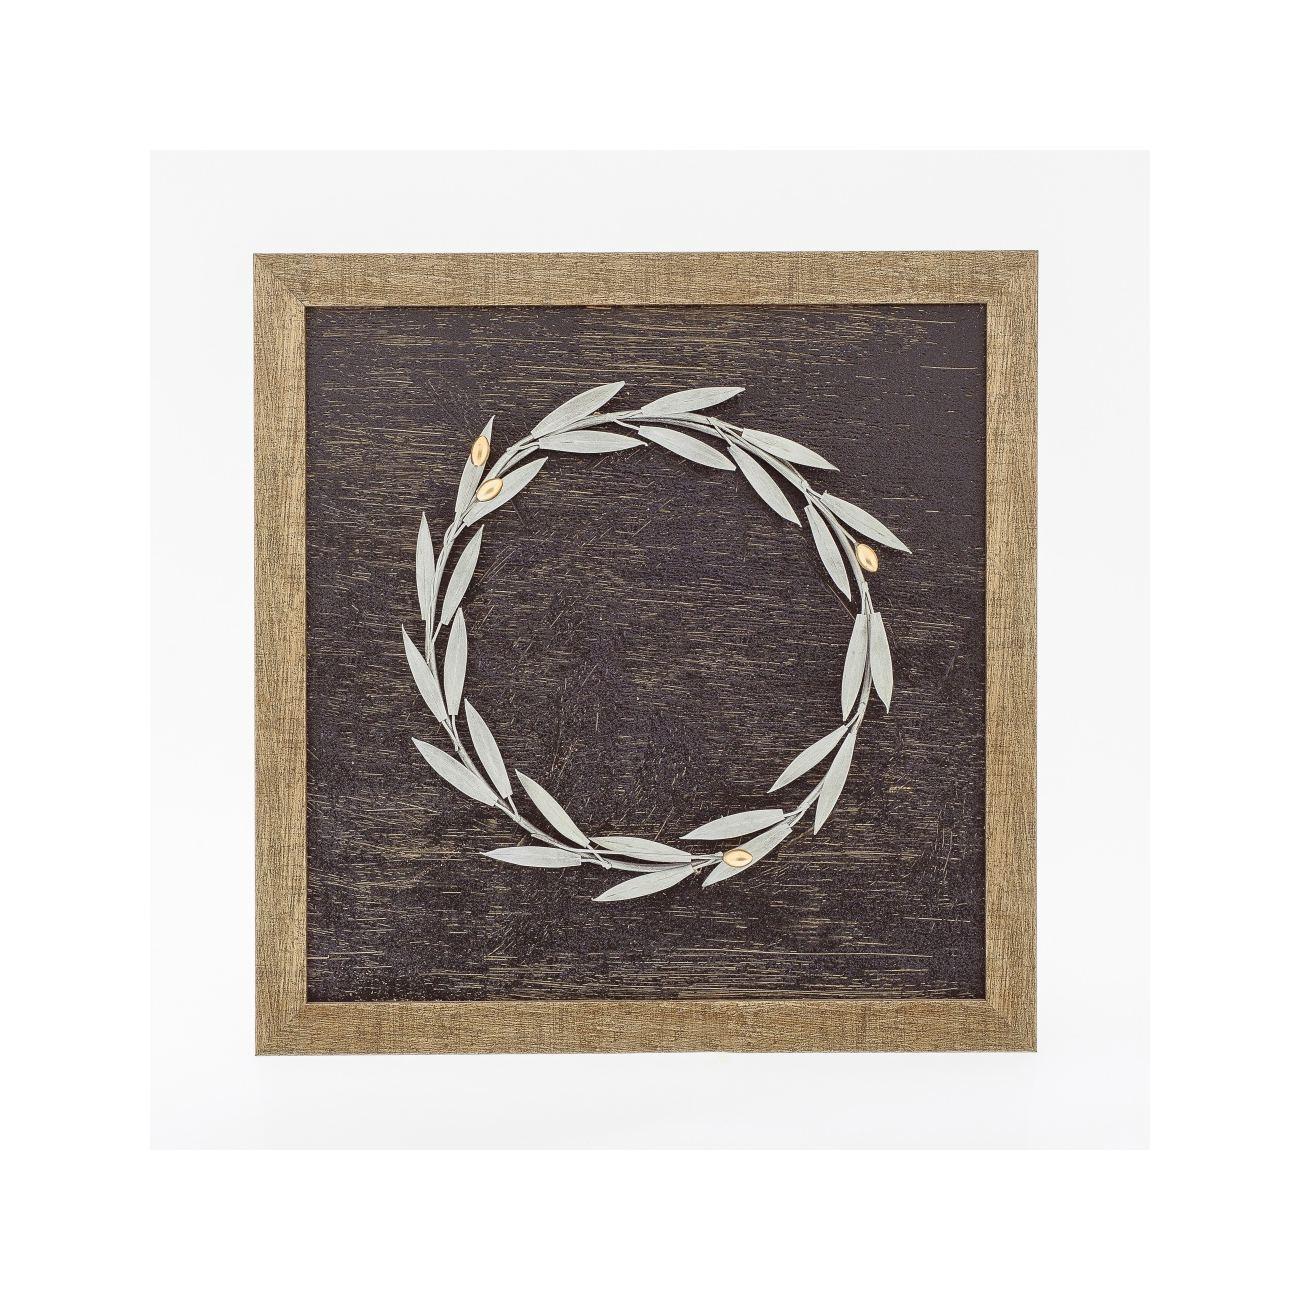 Olive Wreath 3d – Wood & Metal Handmade Wall Framed Artwork – (View 14 of 30)